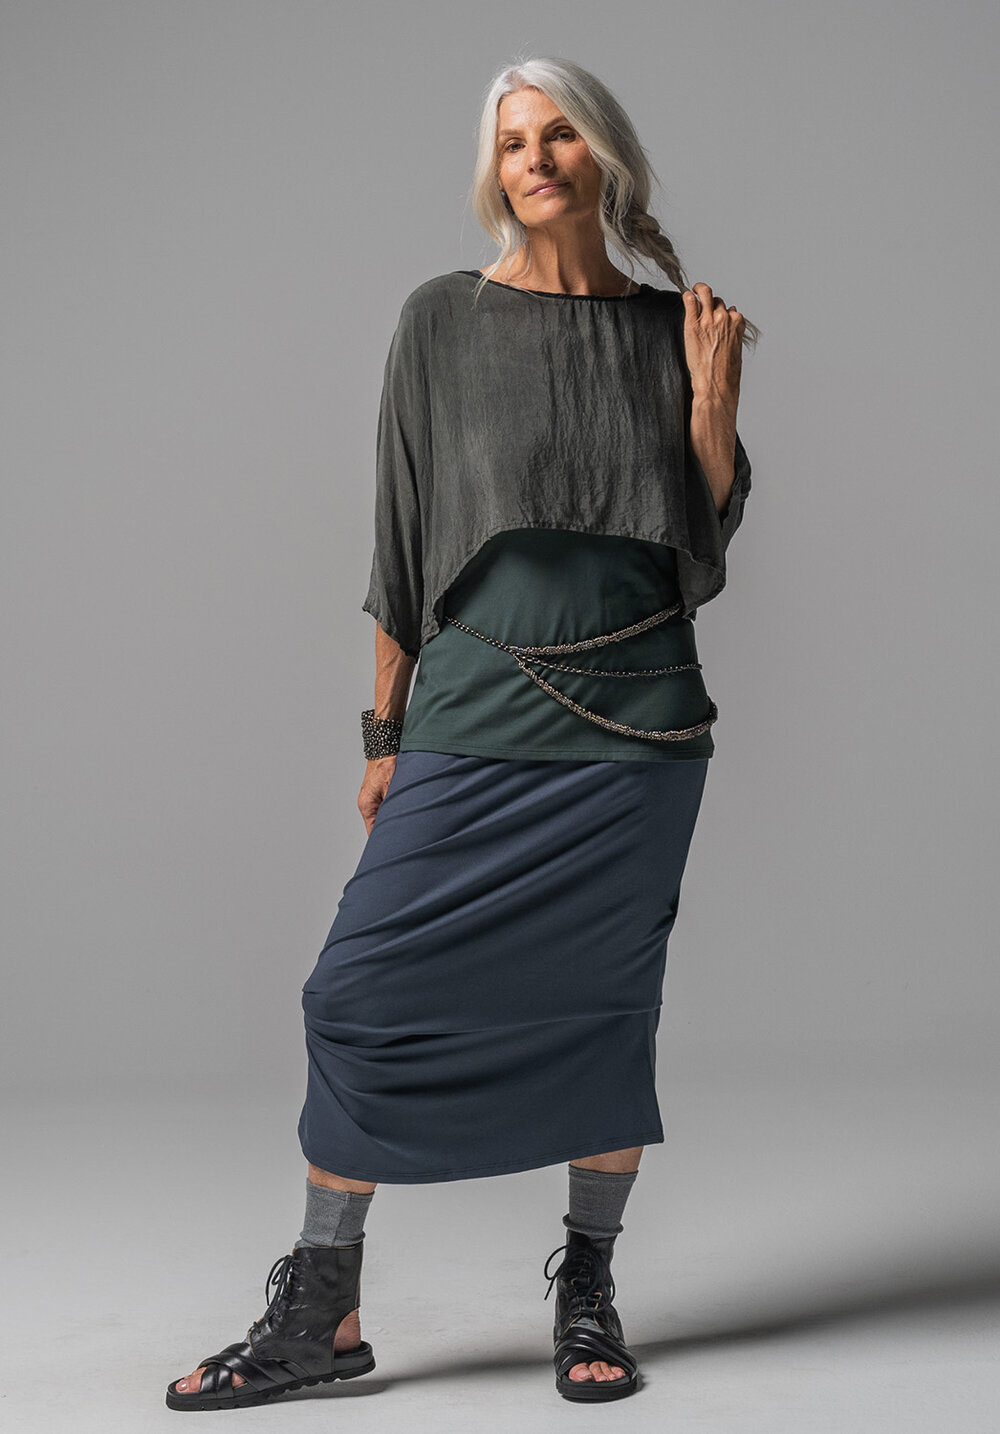 Archive top, Greta singlet + Thea skirt